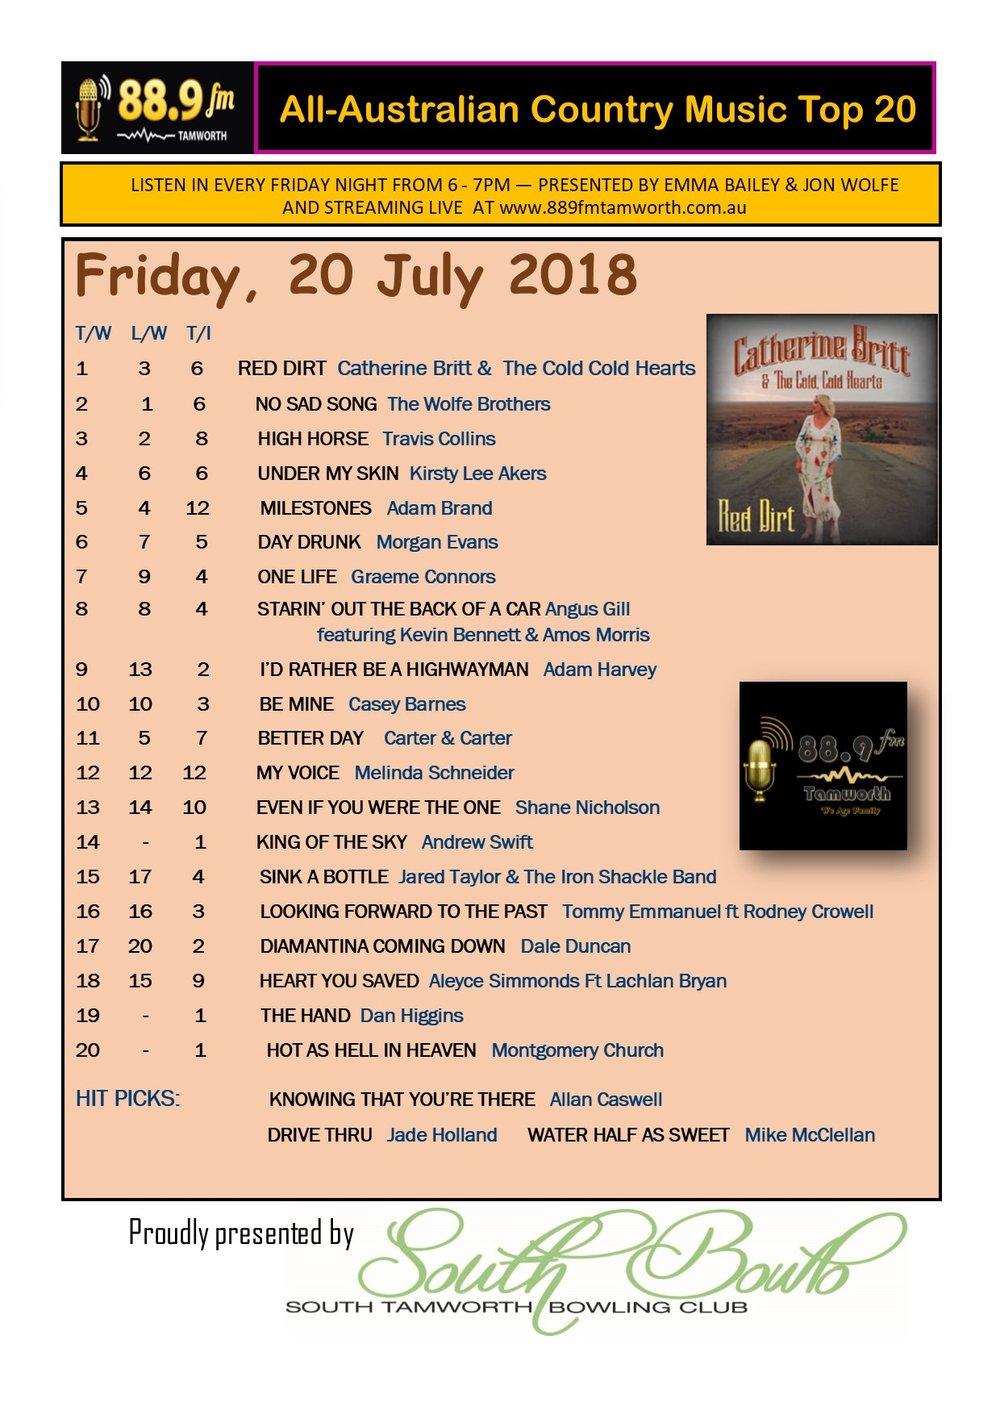 889FM CHART 20 July 2018.jpg